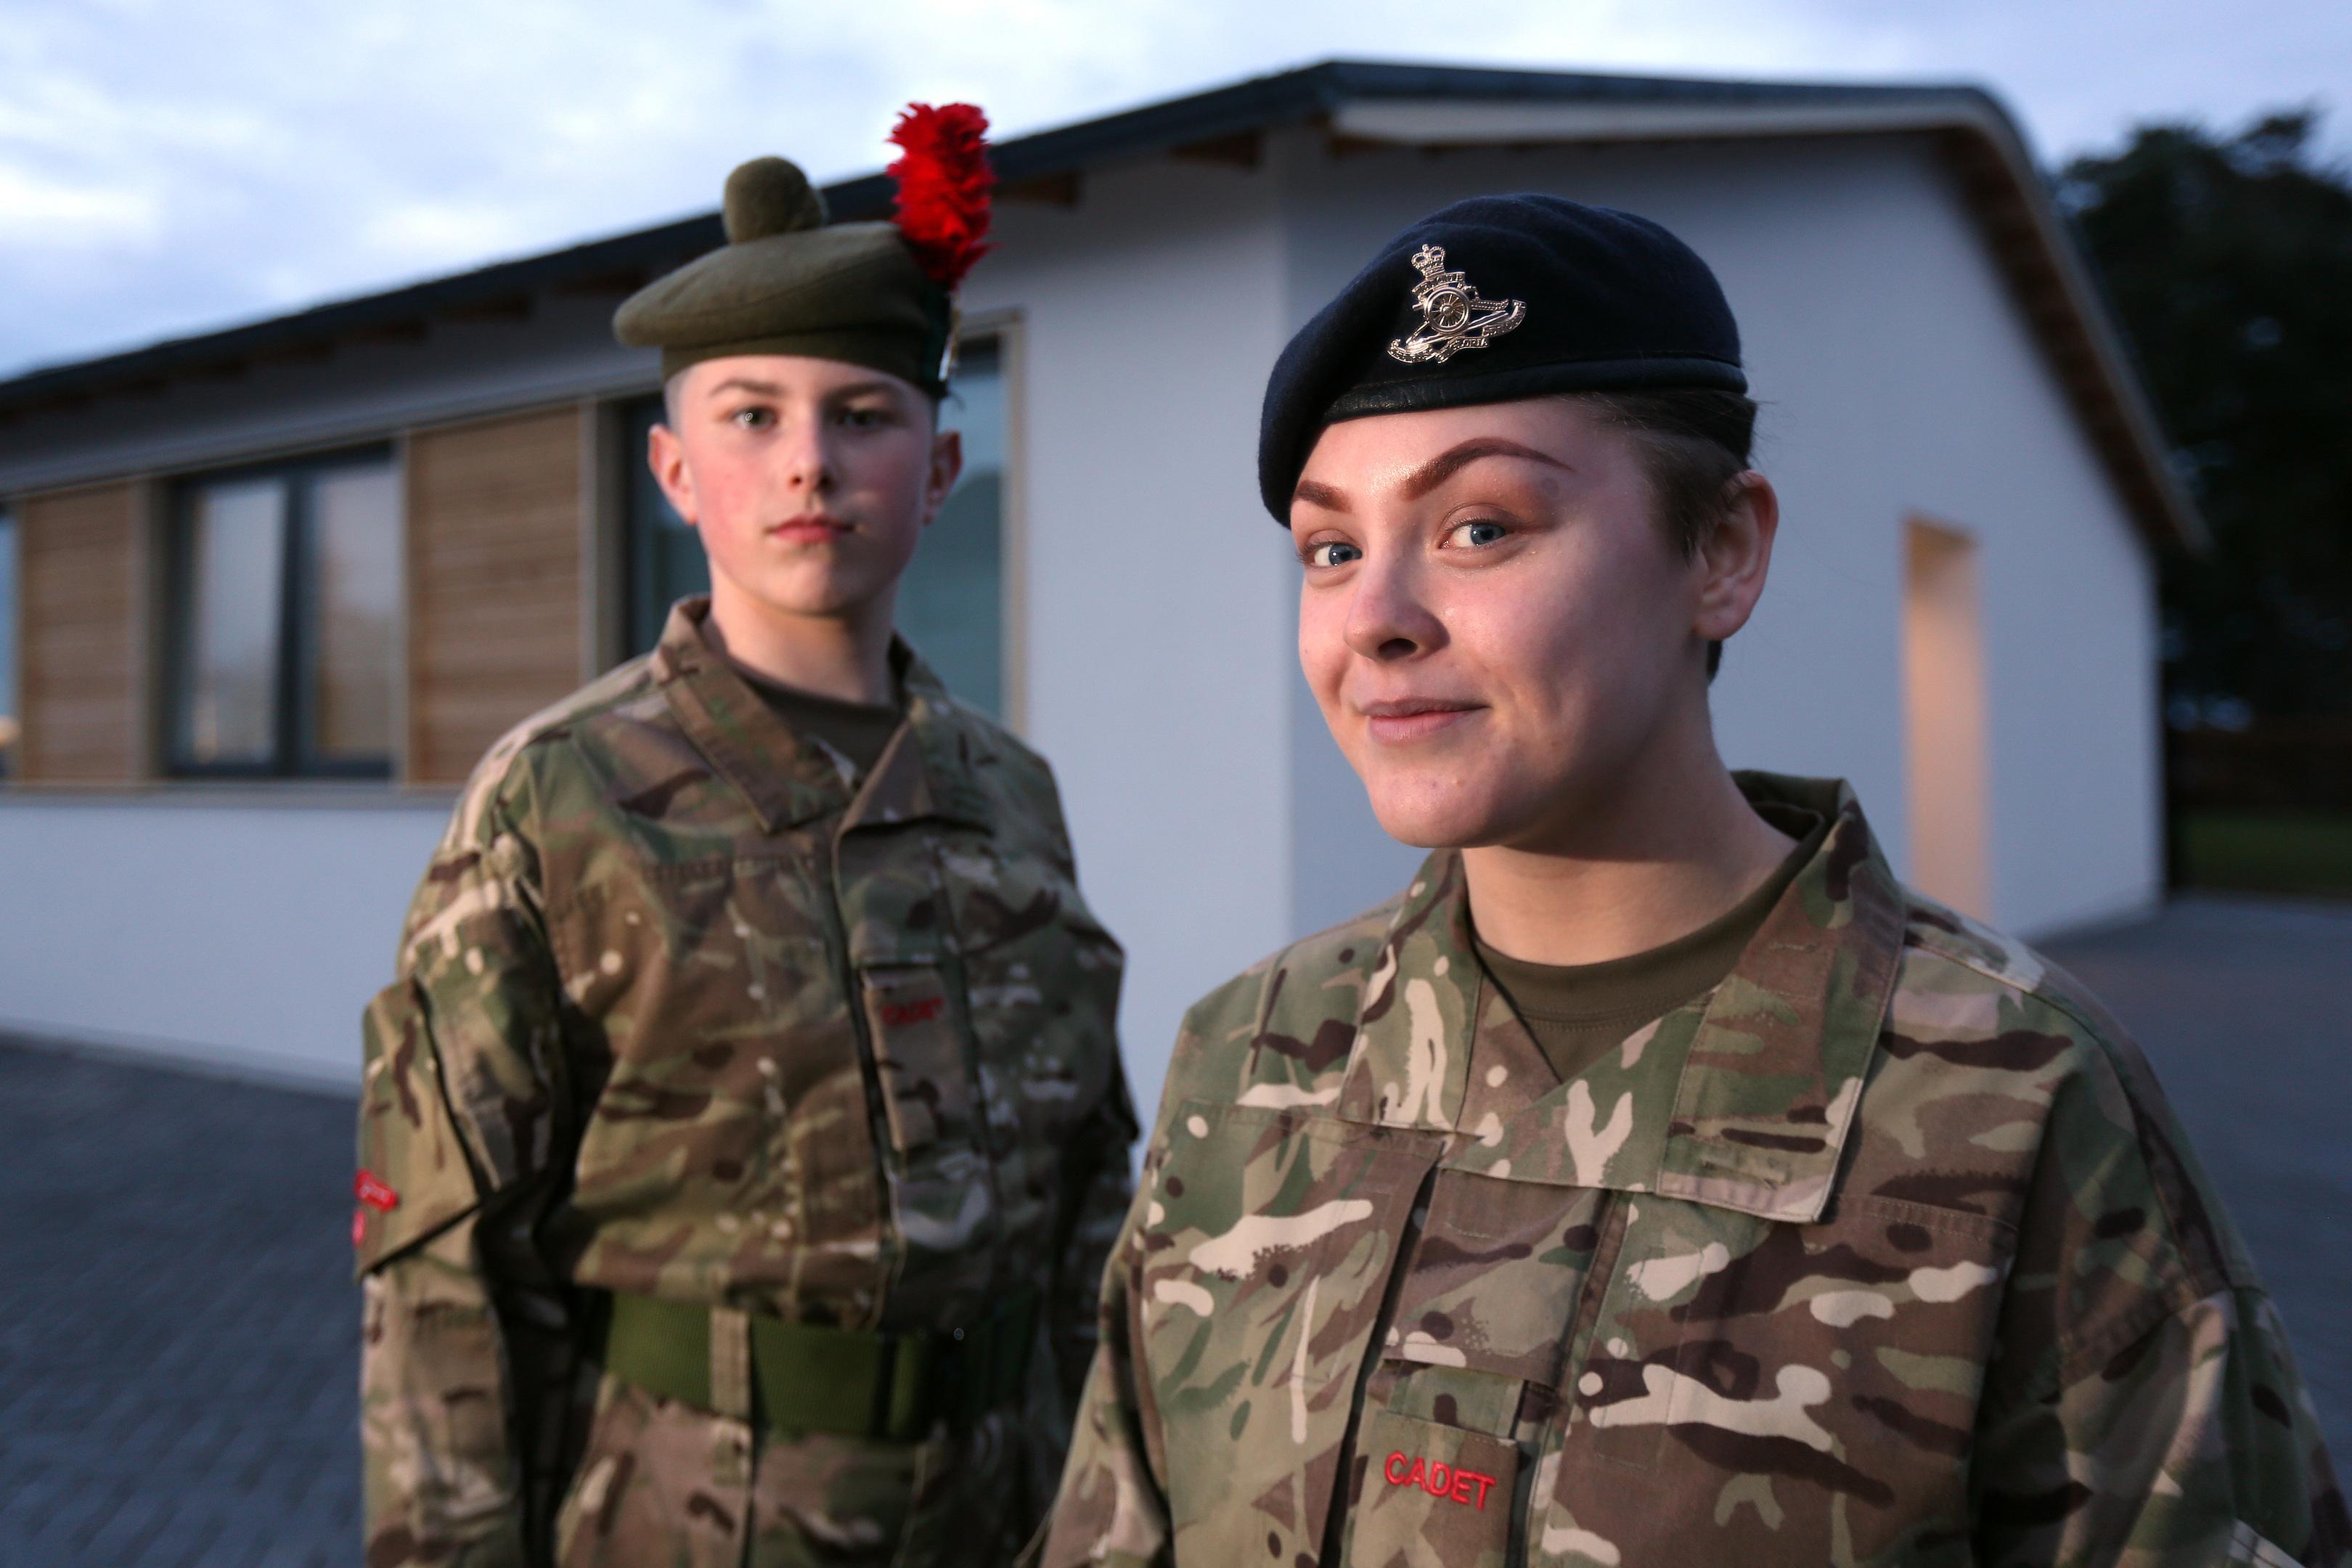 Cadet Kieran Watson and Lance Bombadier Tori Barclay outside the new building.